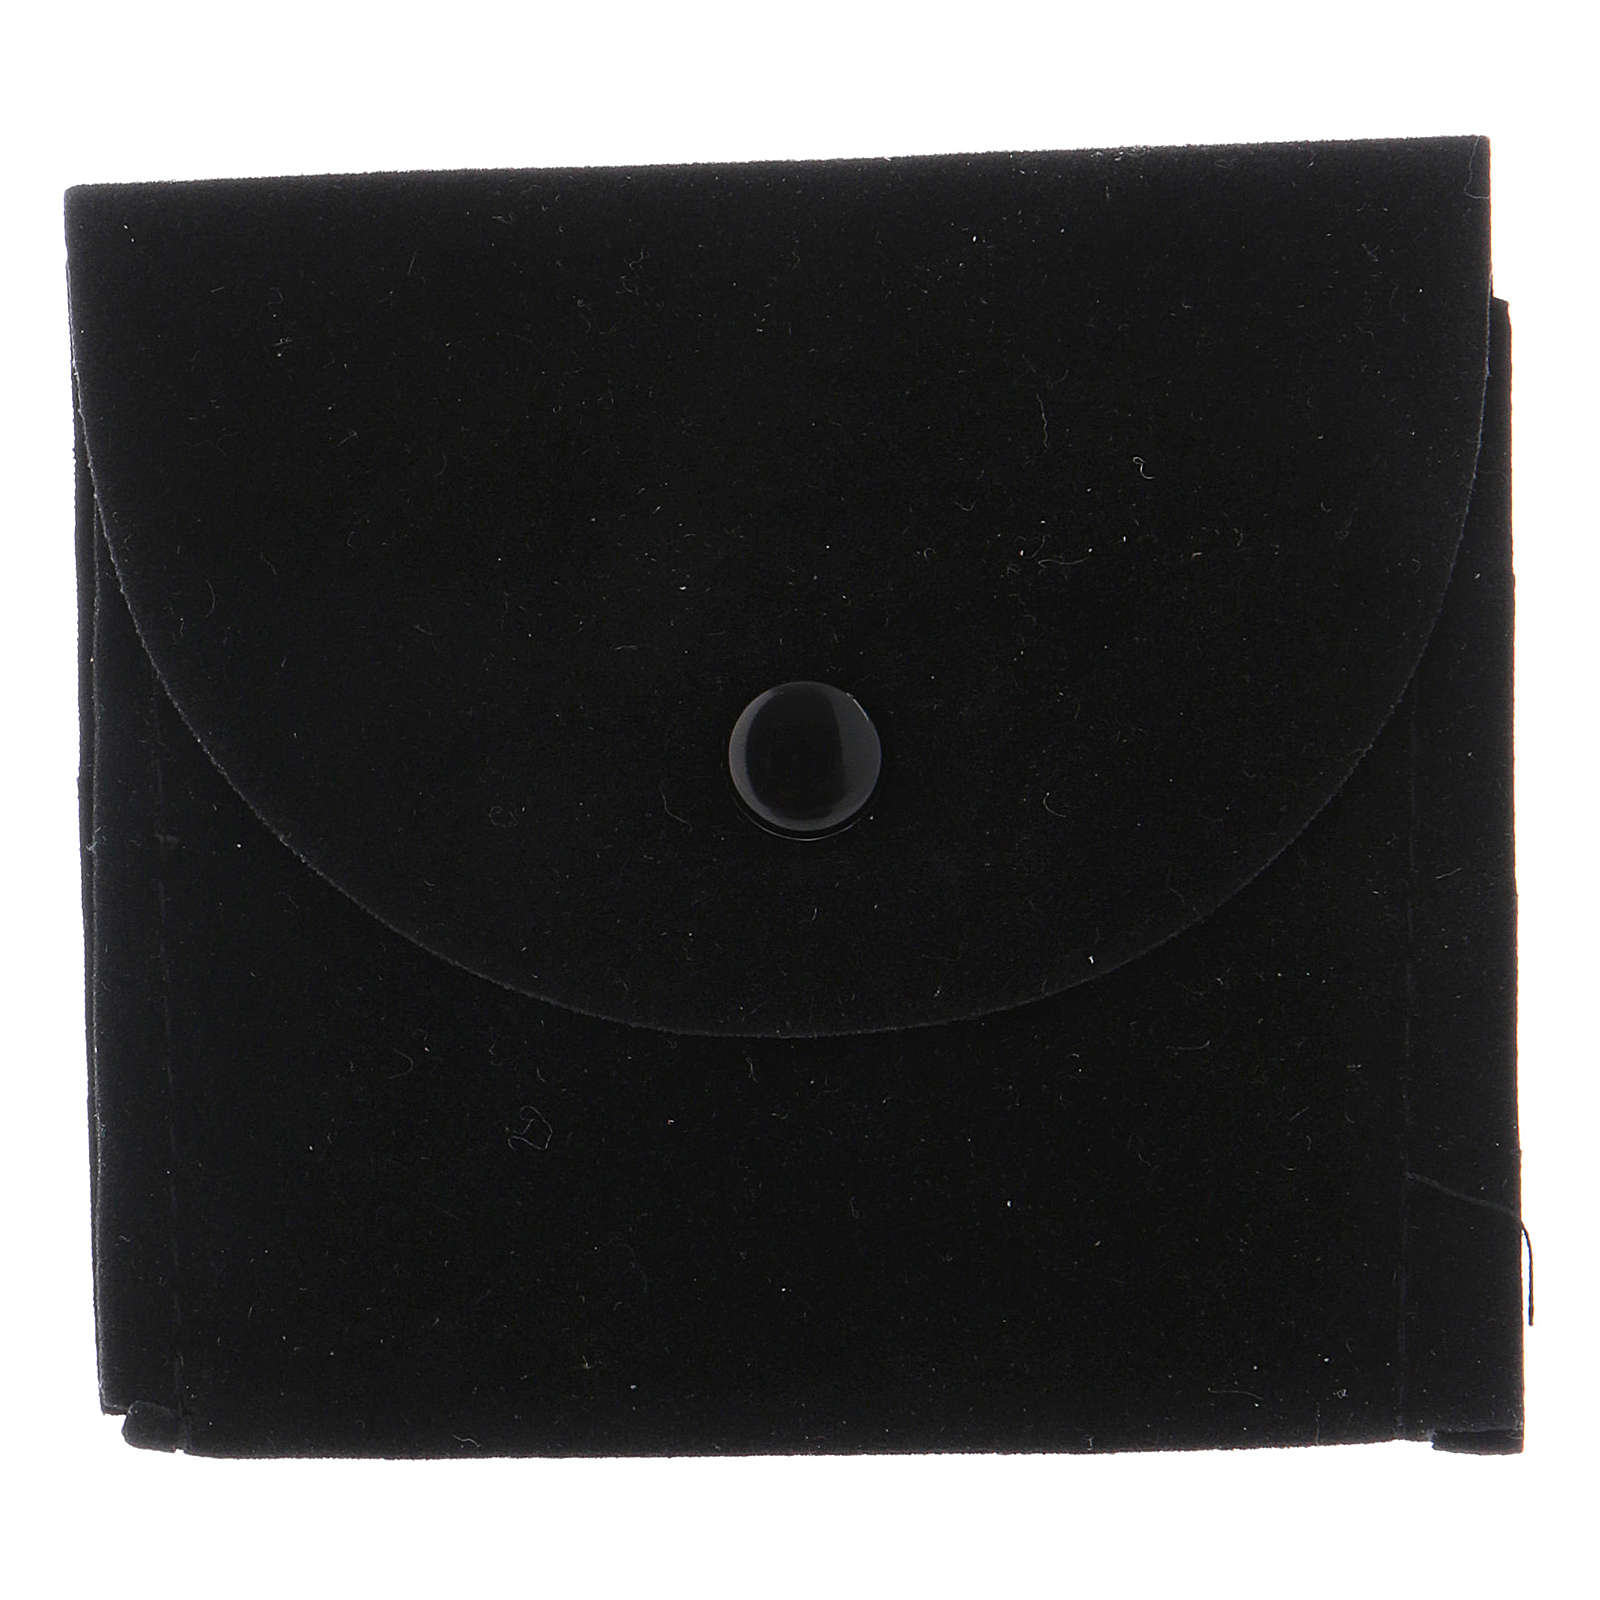 Etui na cyborium torebka zamszowa czarna 3